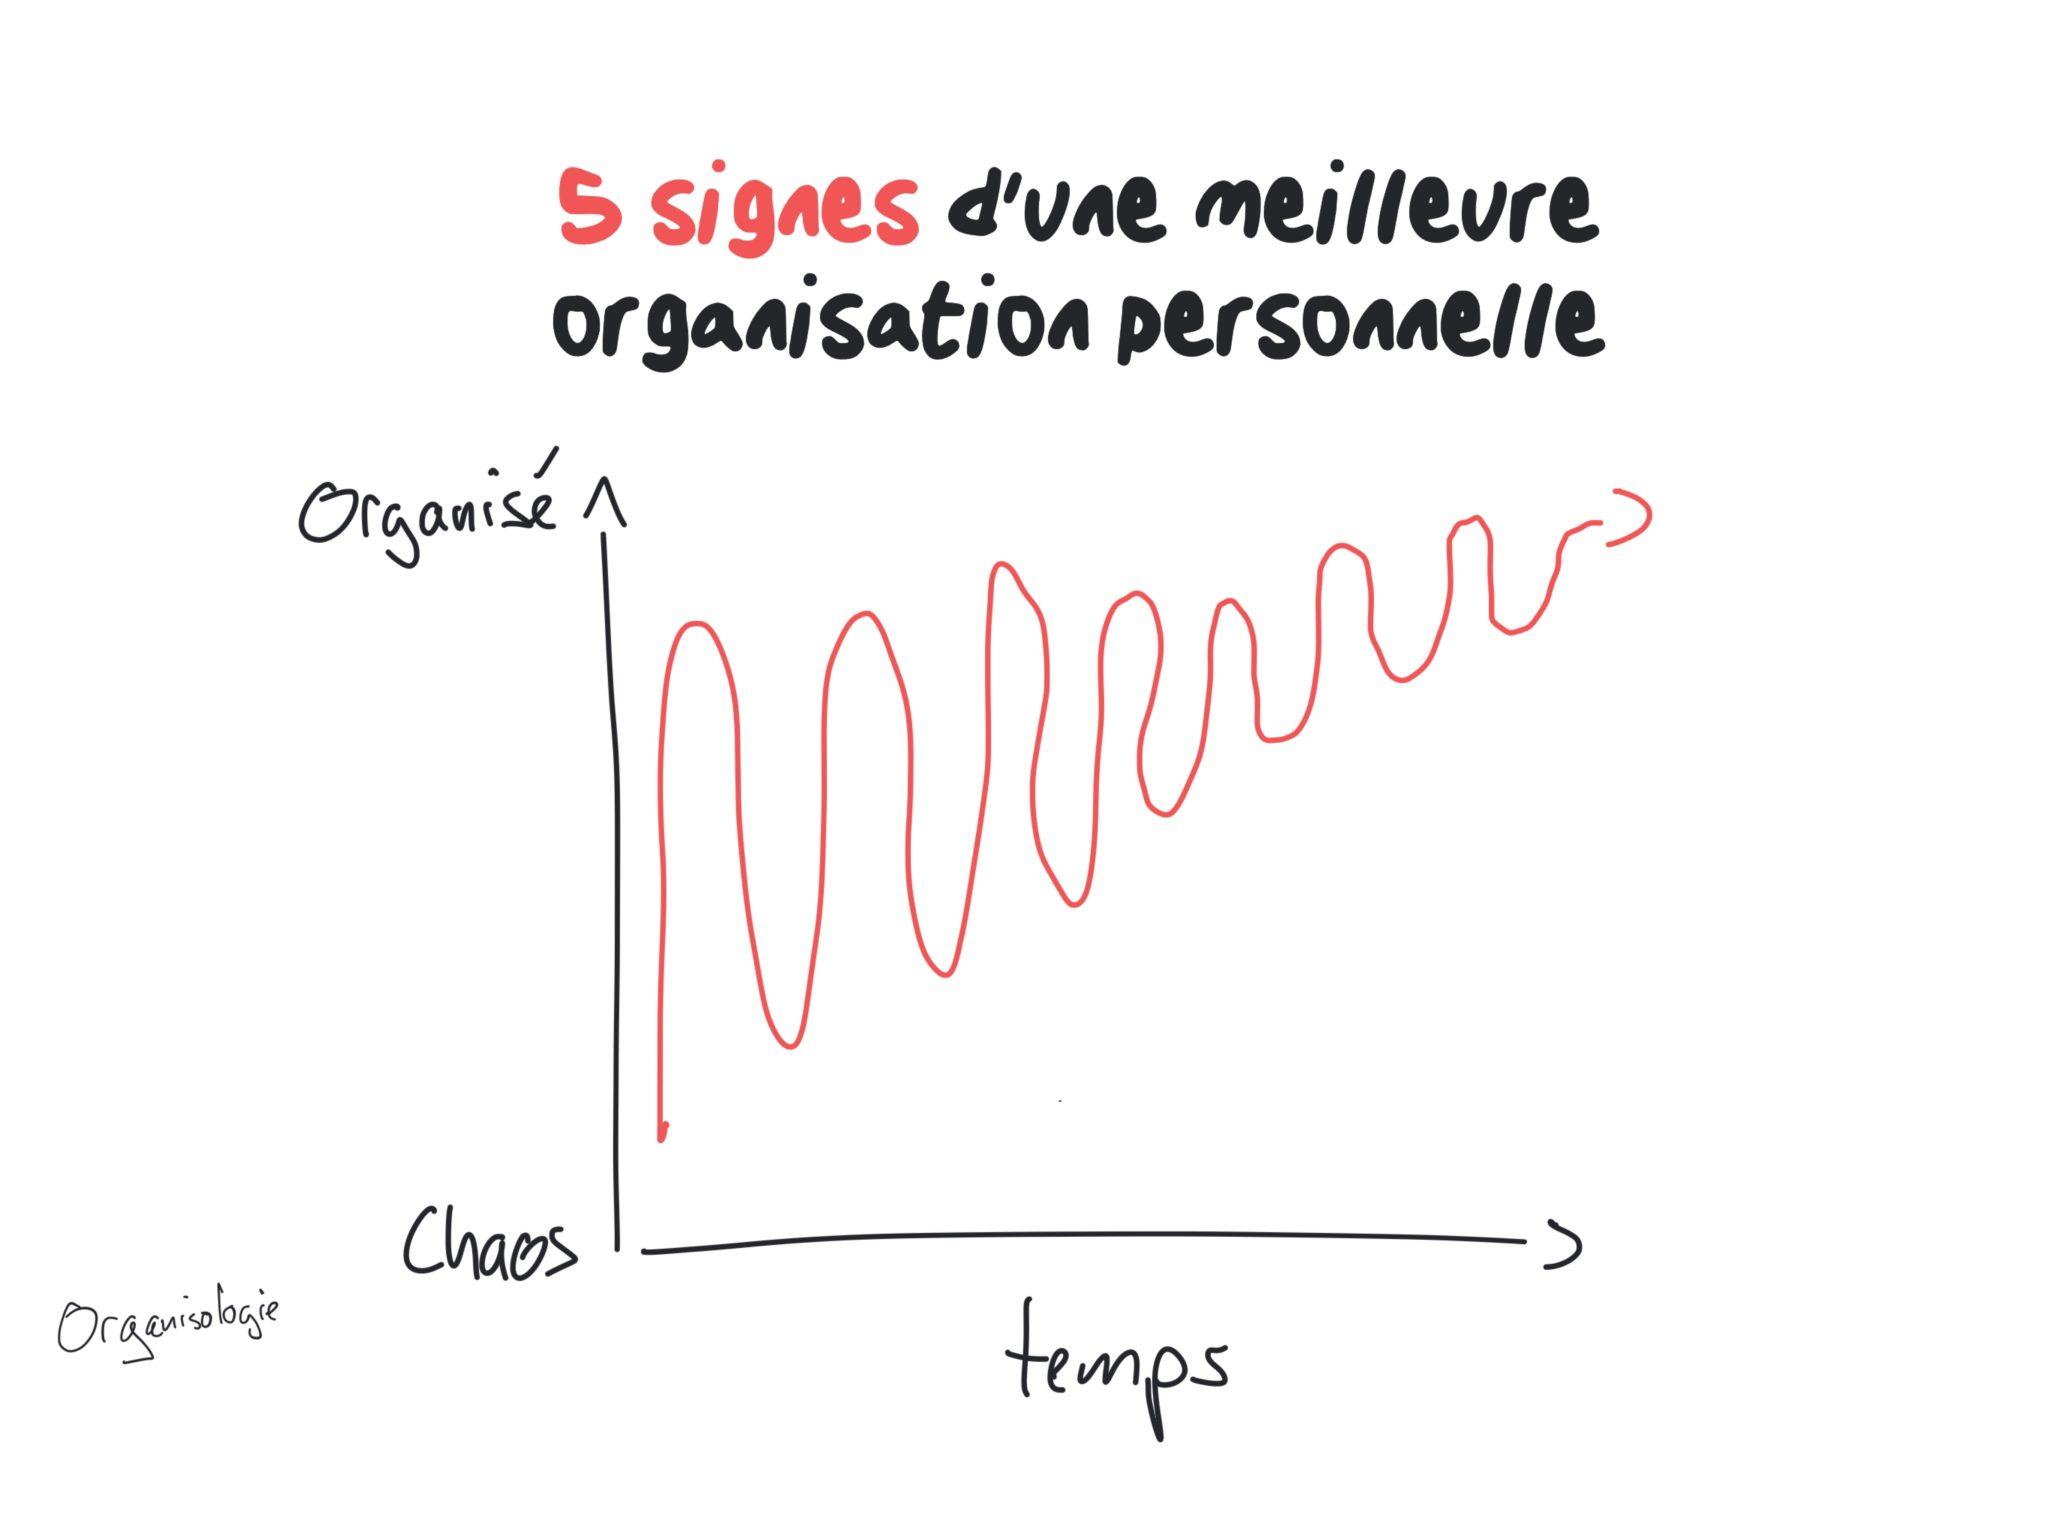 Meilleure organisation personnelle